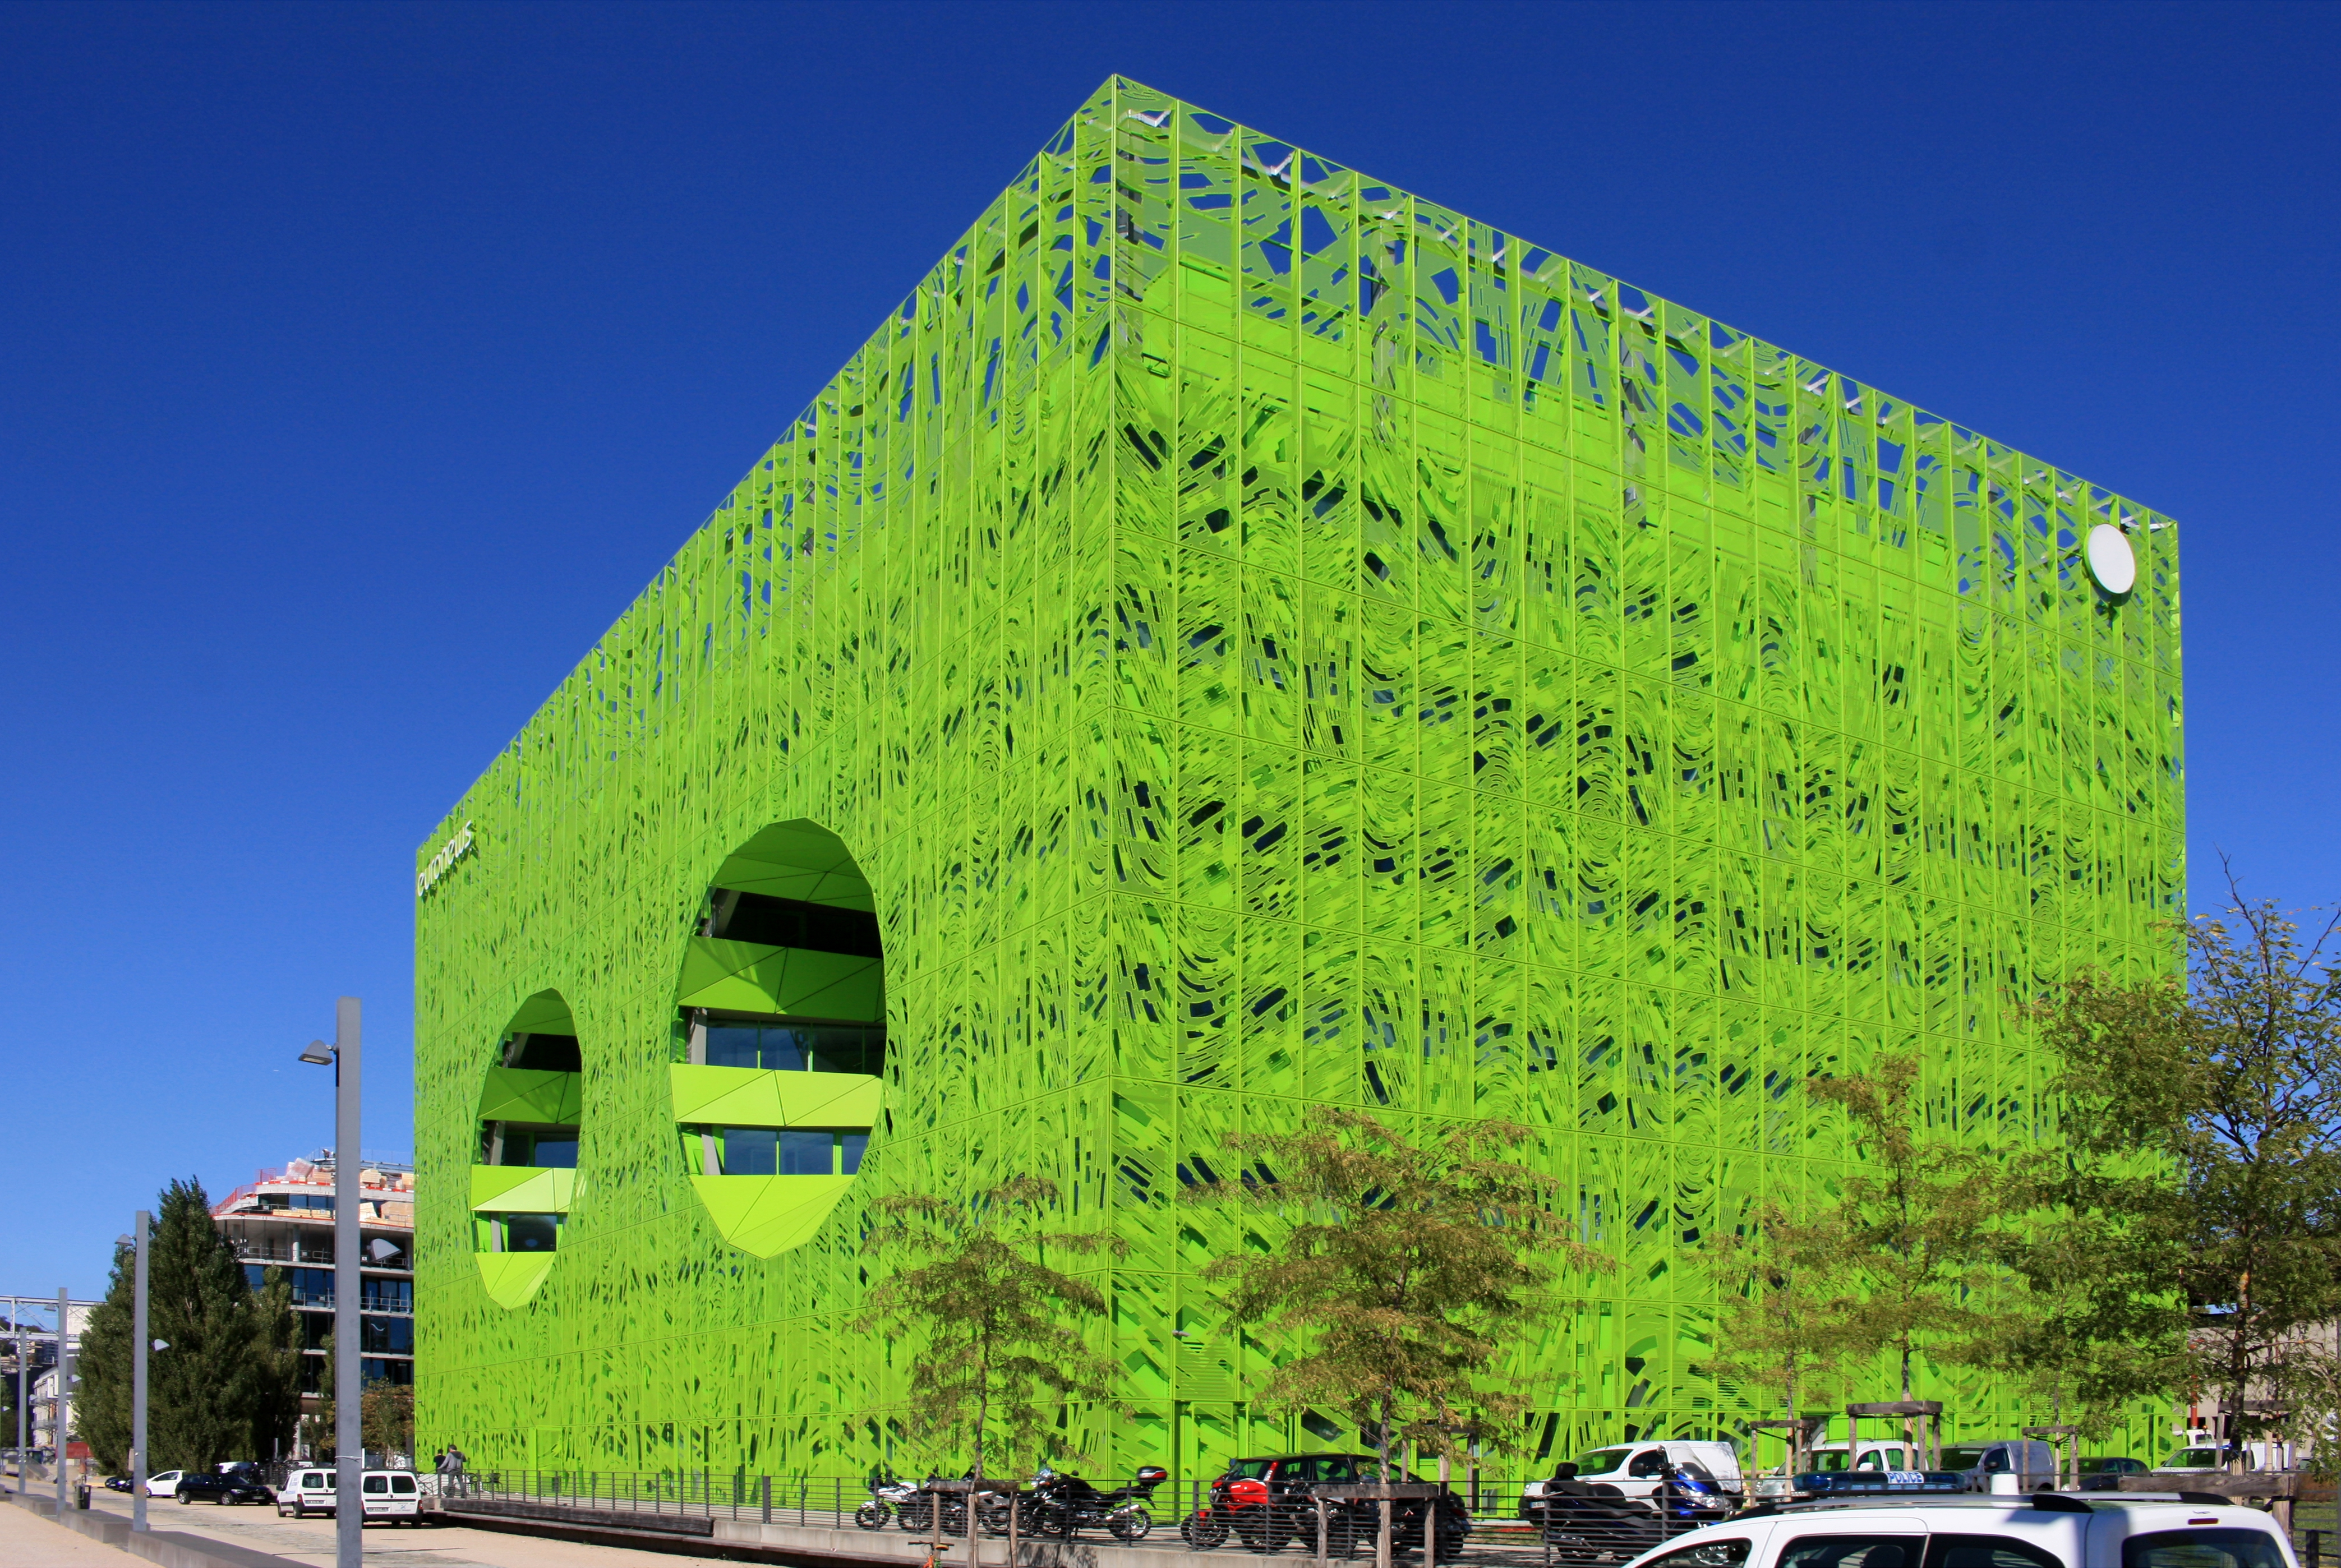 photographes en rh ne alpes le cube vert architectes jakob macfarlane. Black Bedroom Furniture Sets. Home Design Ideas